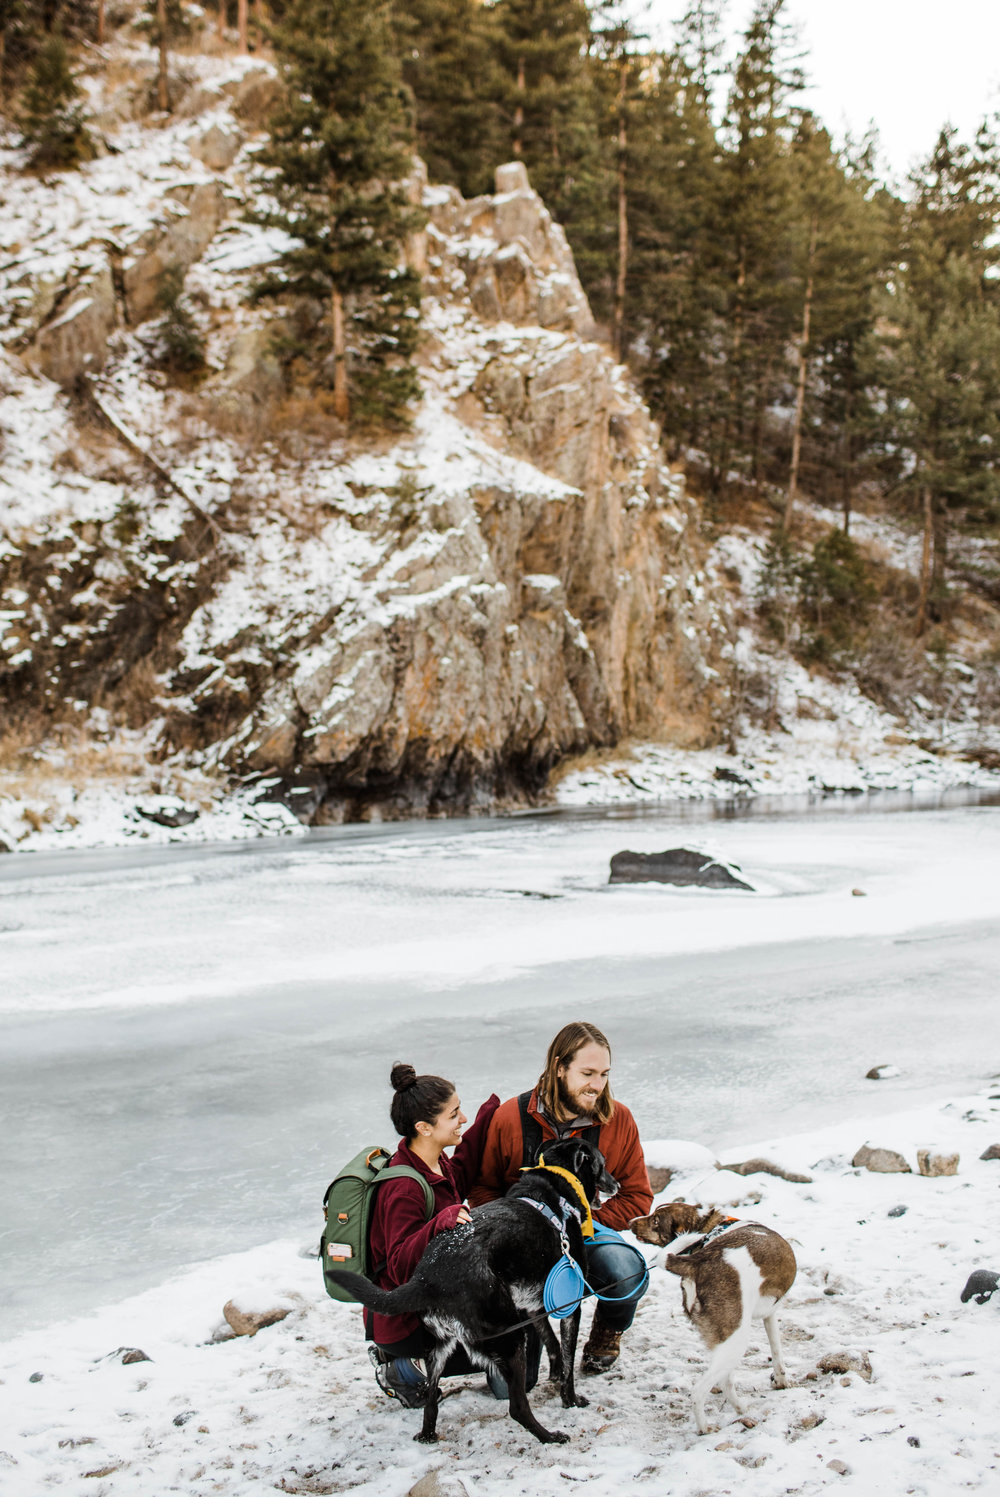 Sheena_Shahangian_Photography_Fort_Collins_Colorado_Rocky_Mountain_Adventure_Mountain_Session_Ed_Sheena-3.jpg